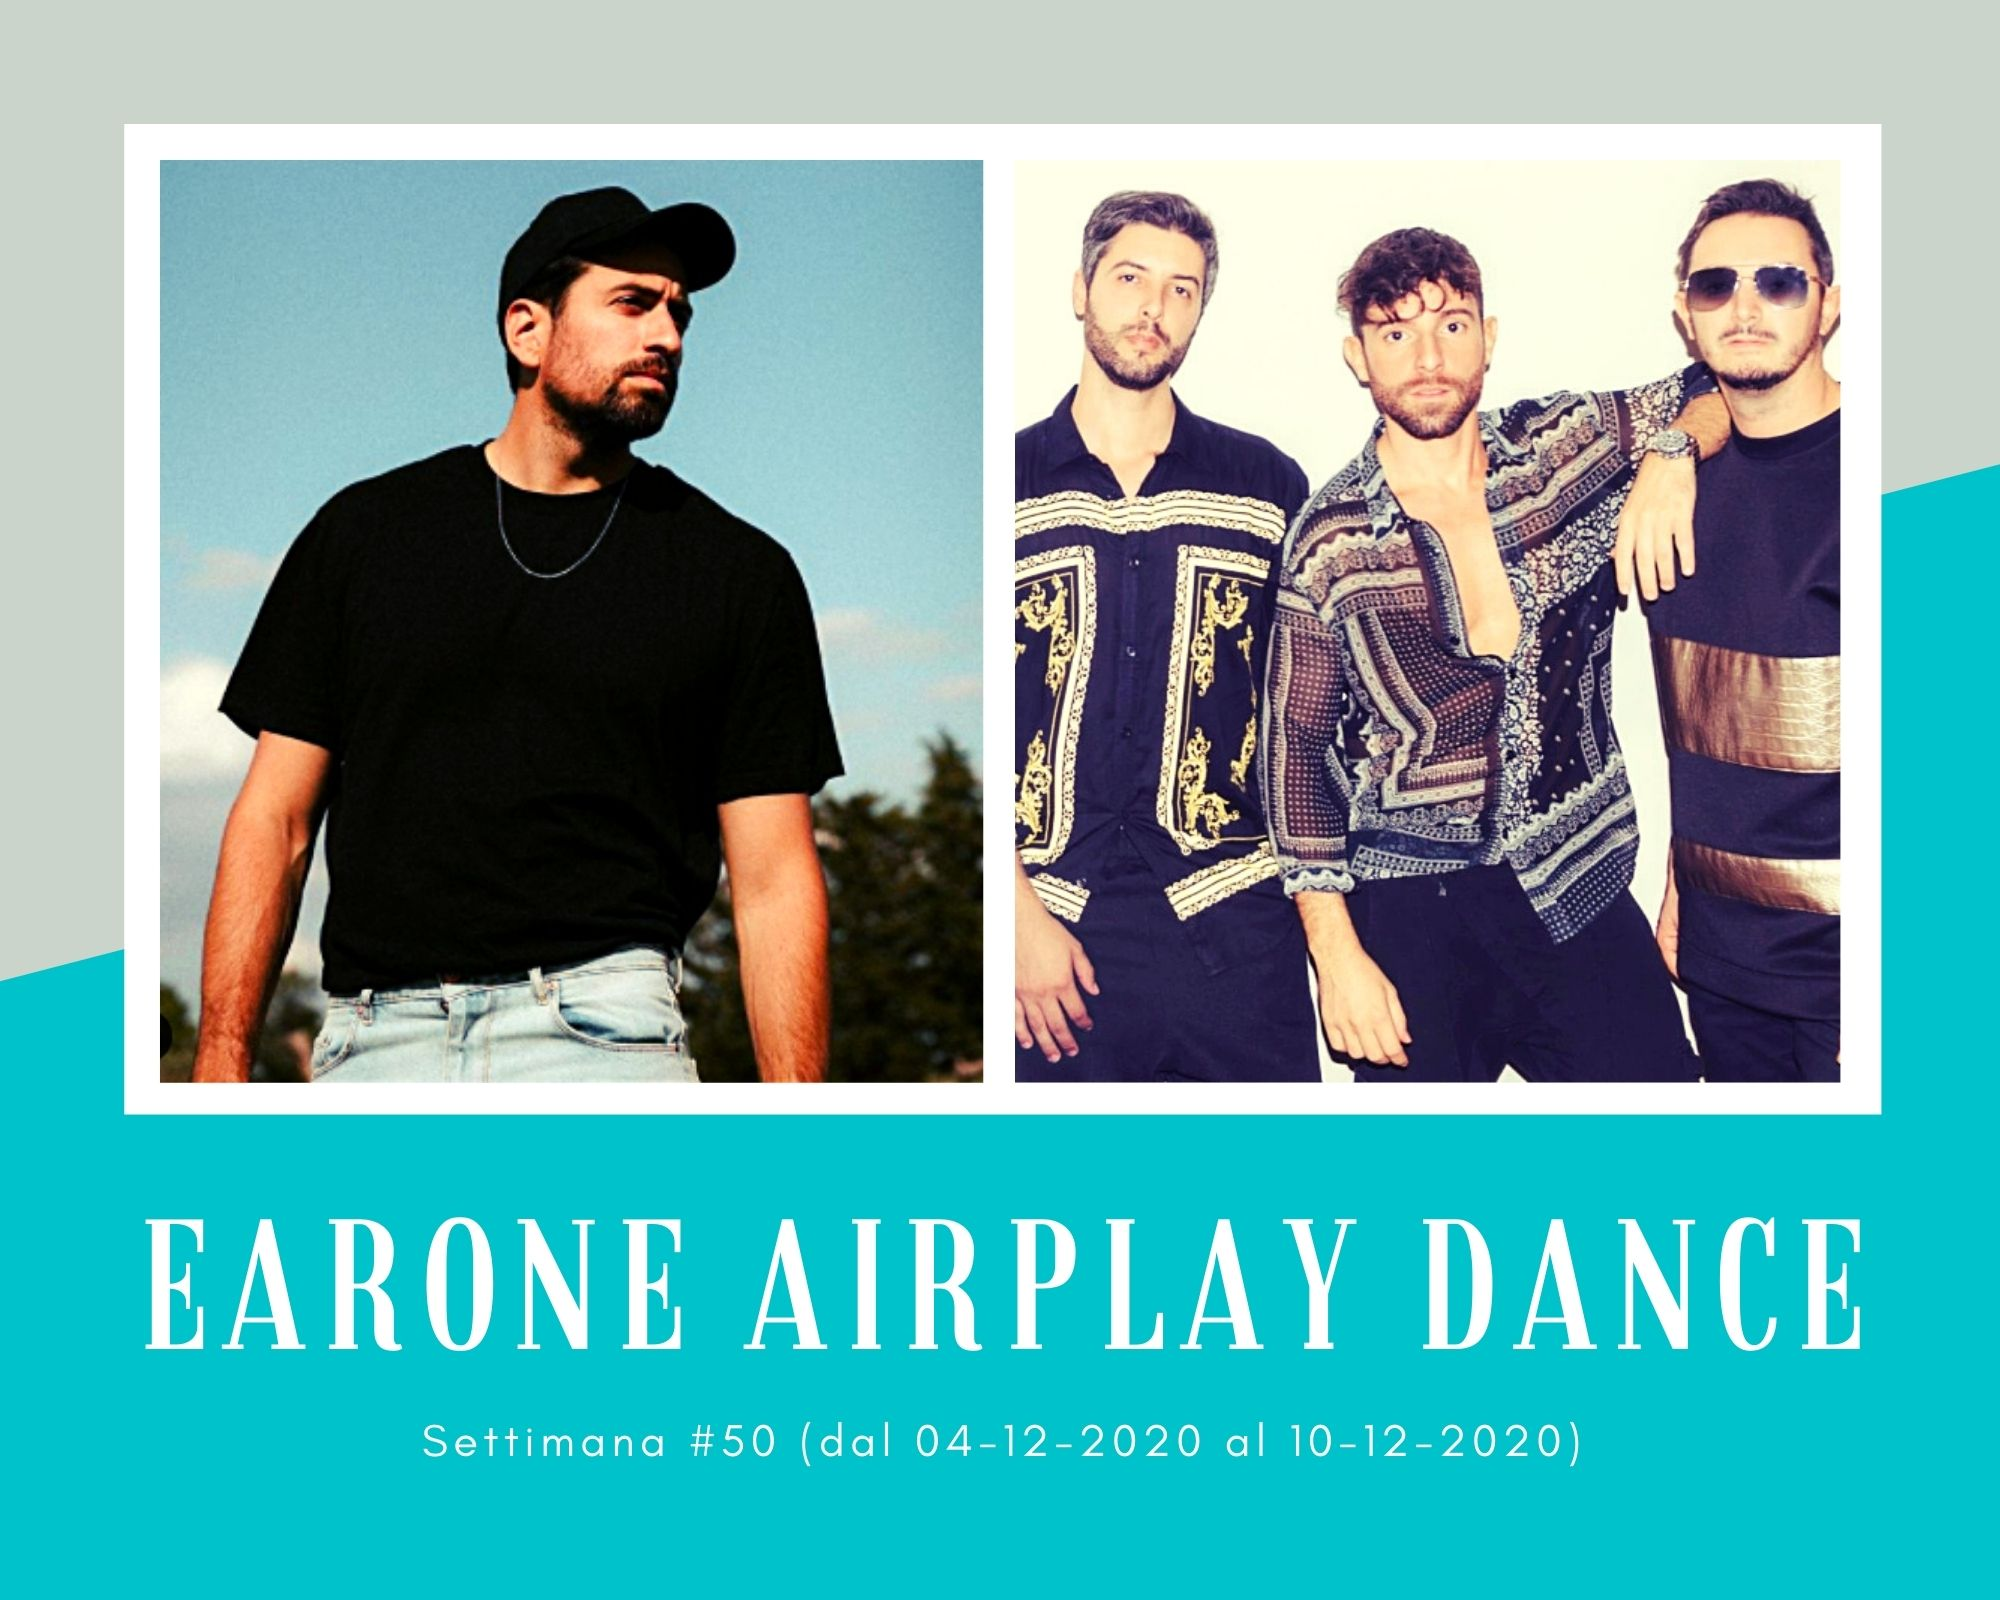 Classifica Radio EARONE Airplay Dance, week 50. I Meduza alle spalle di Dotan